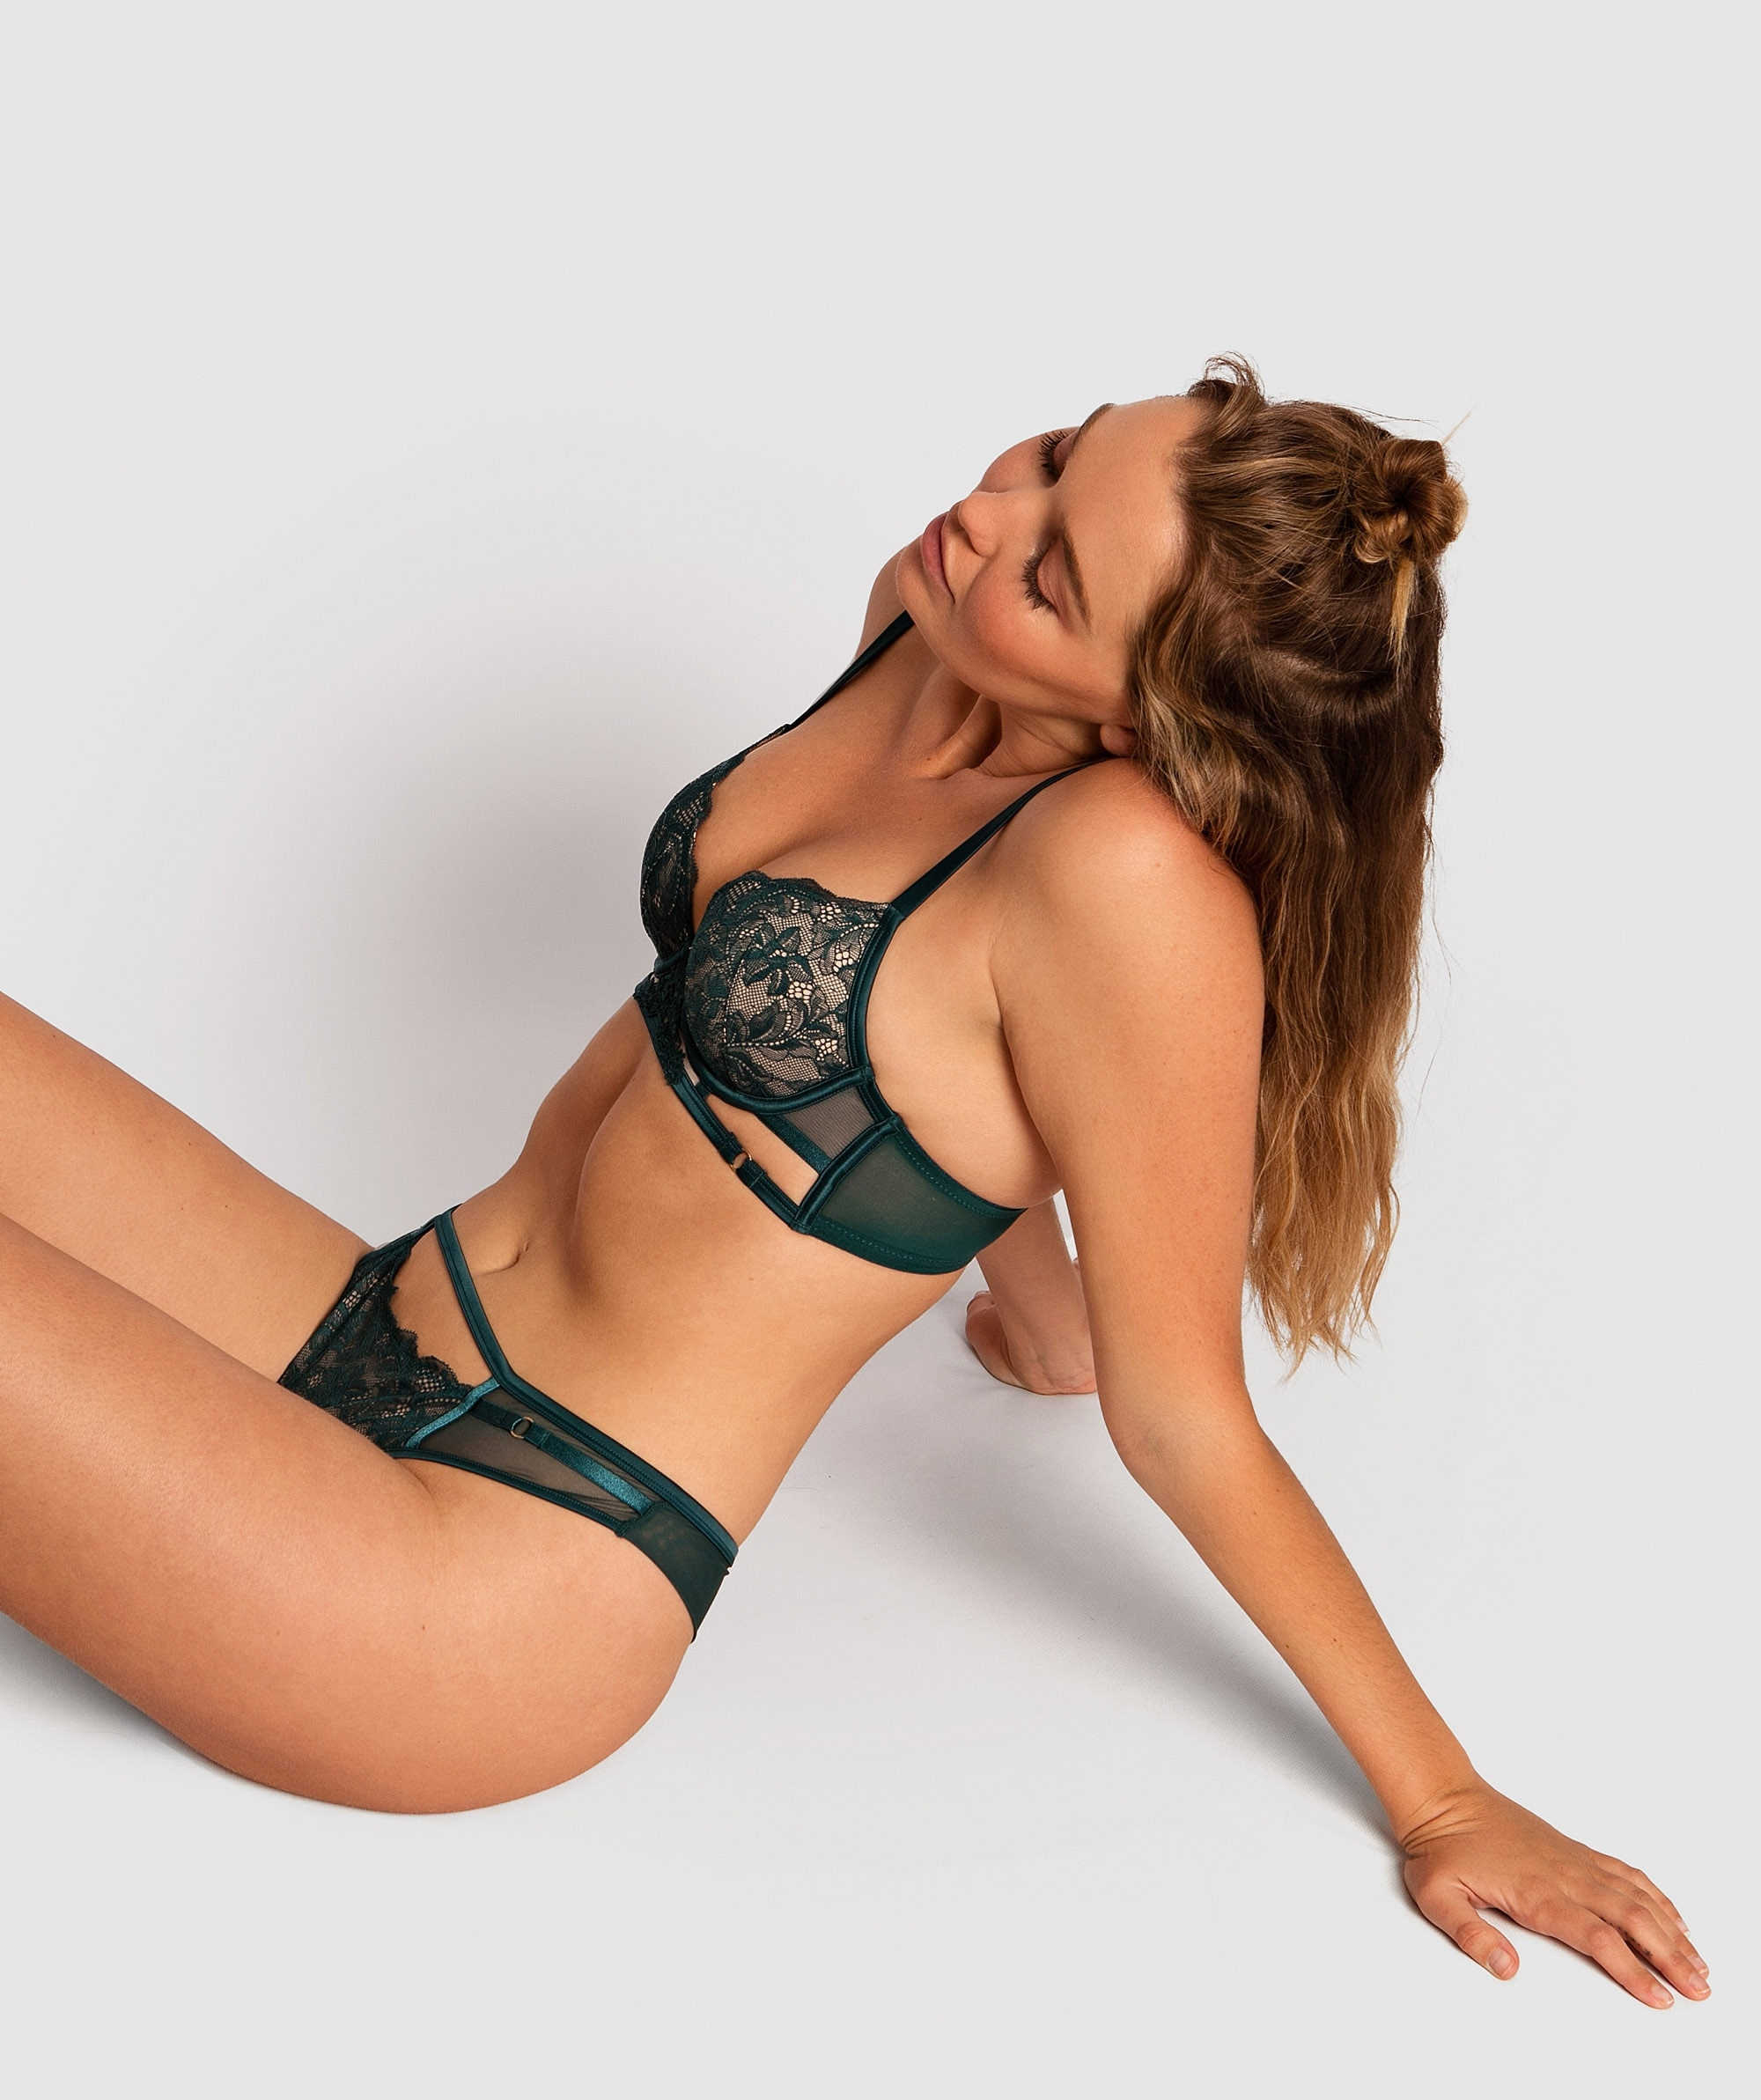 Alice Plunge Contour Bra - Dark Green/Nude